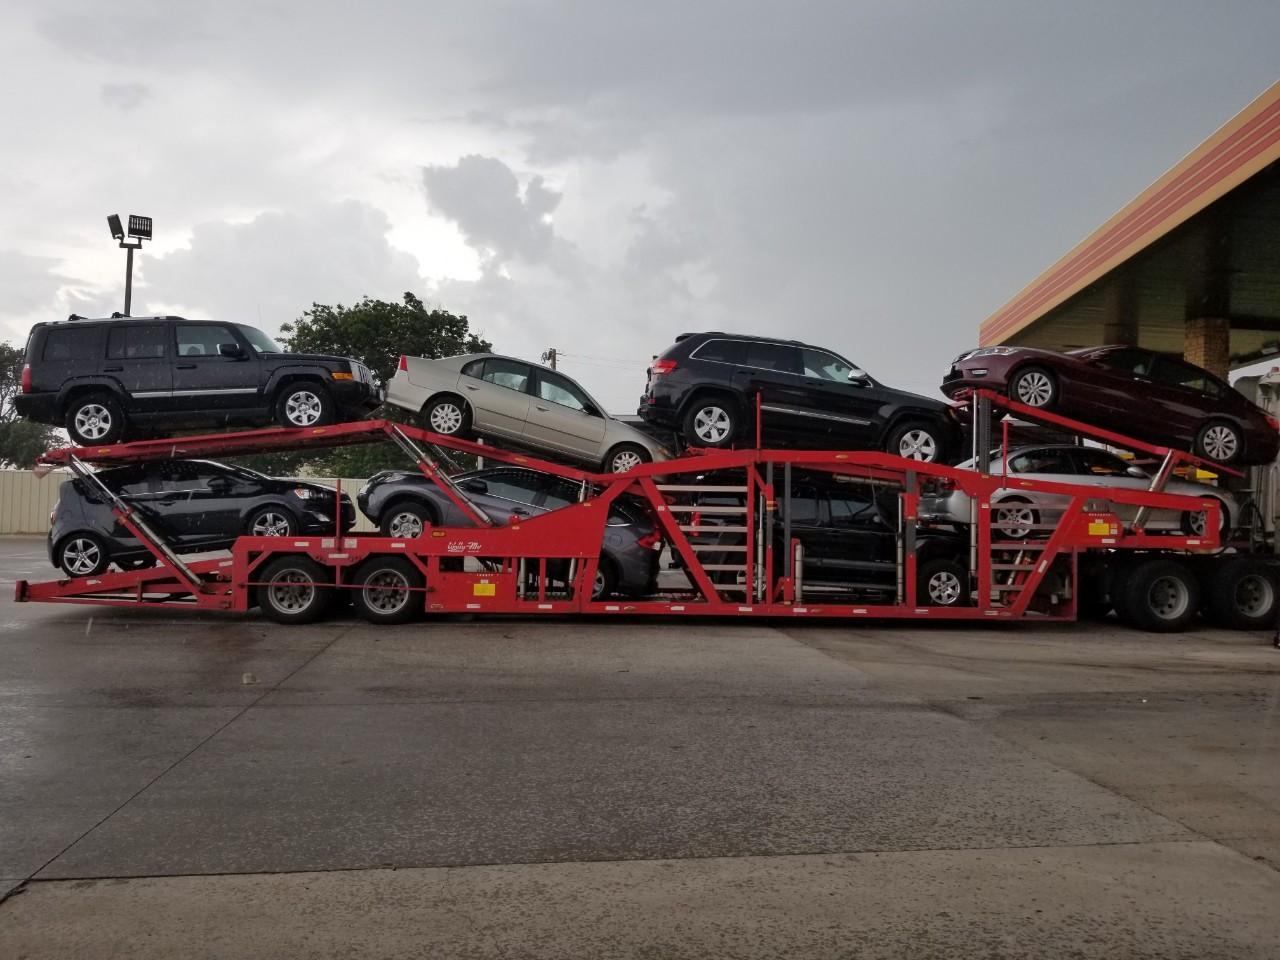 car hauling - Monza berglauf-verband com